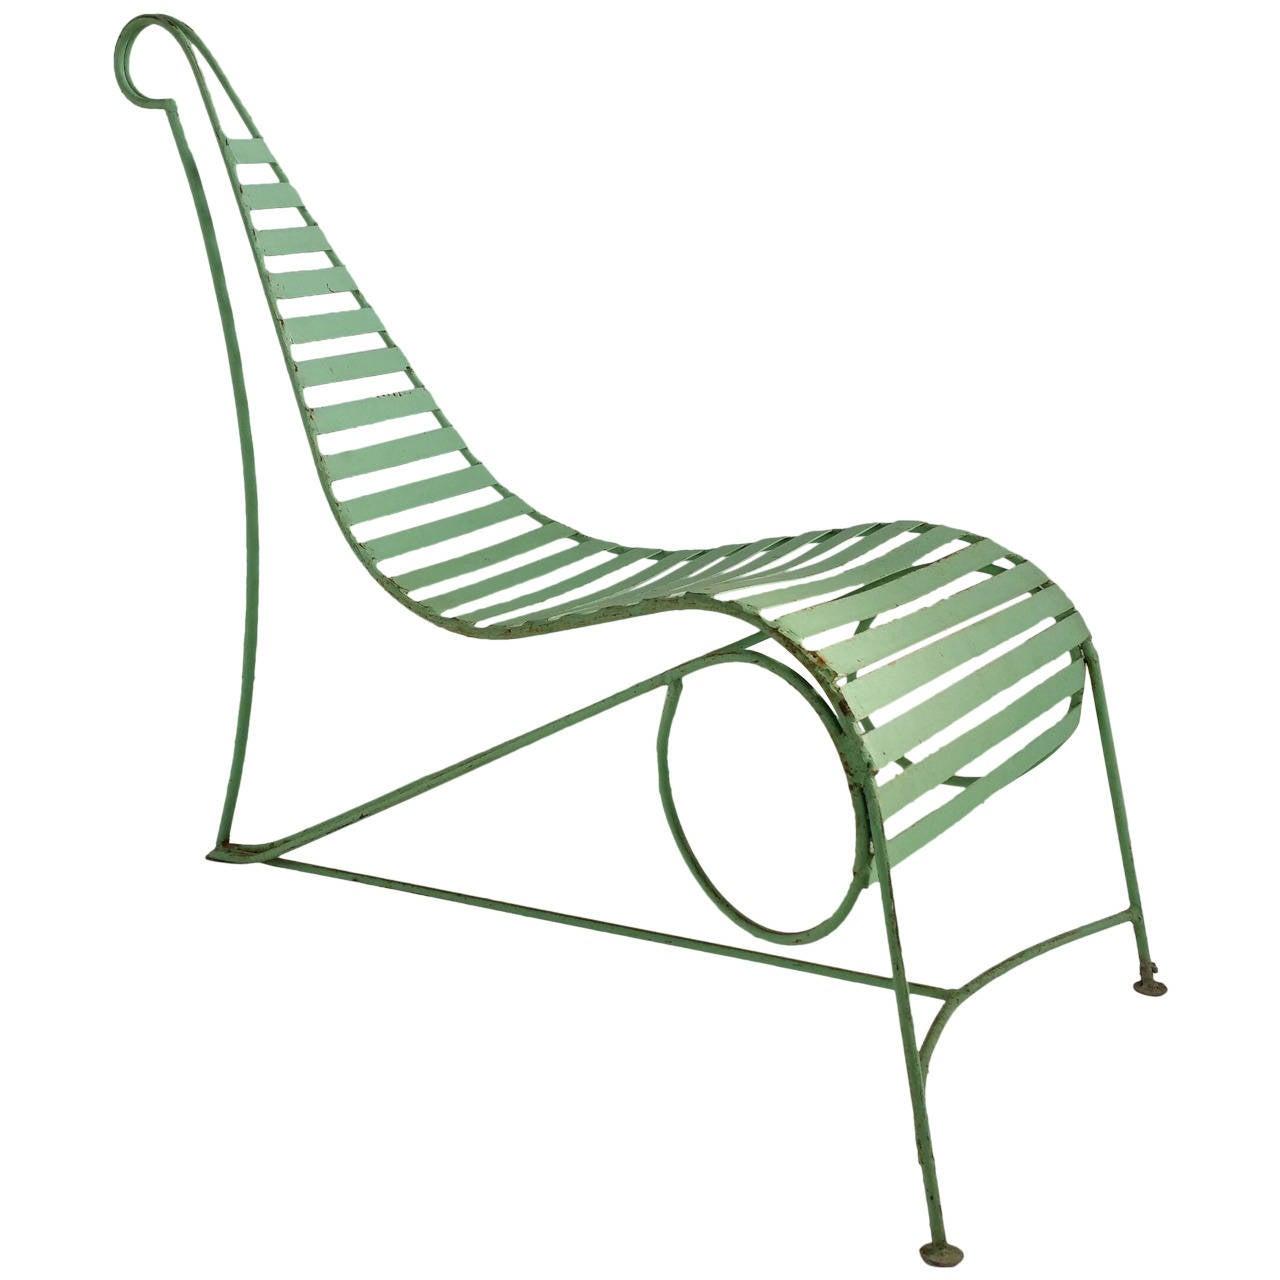 Amazing Modernist Iron Garden Lounge Chair Manner Of Andre Dubreuil Cjindustries Chair Design For Home Cjindustriesco